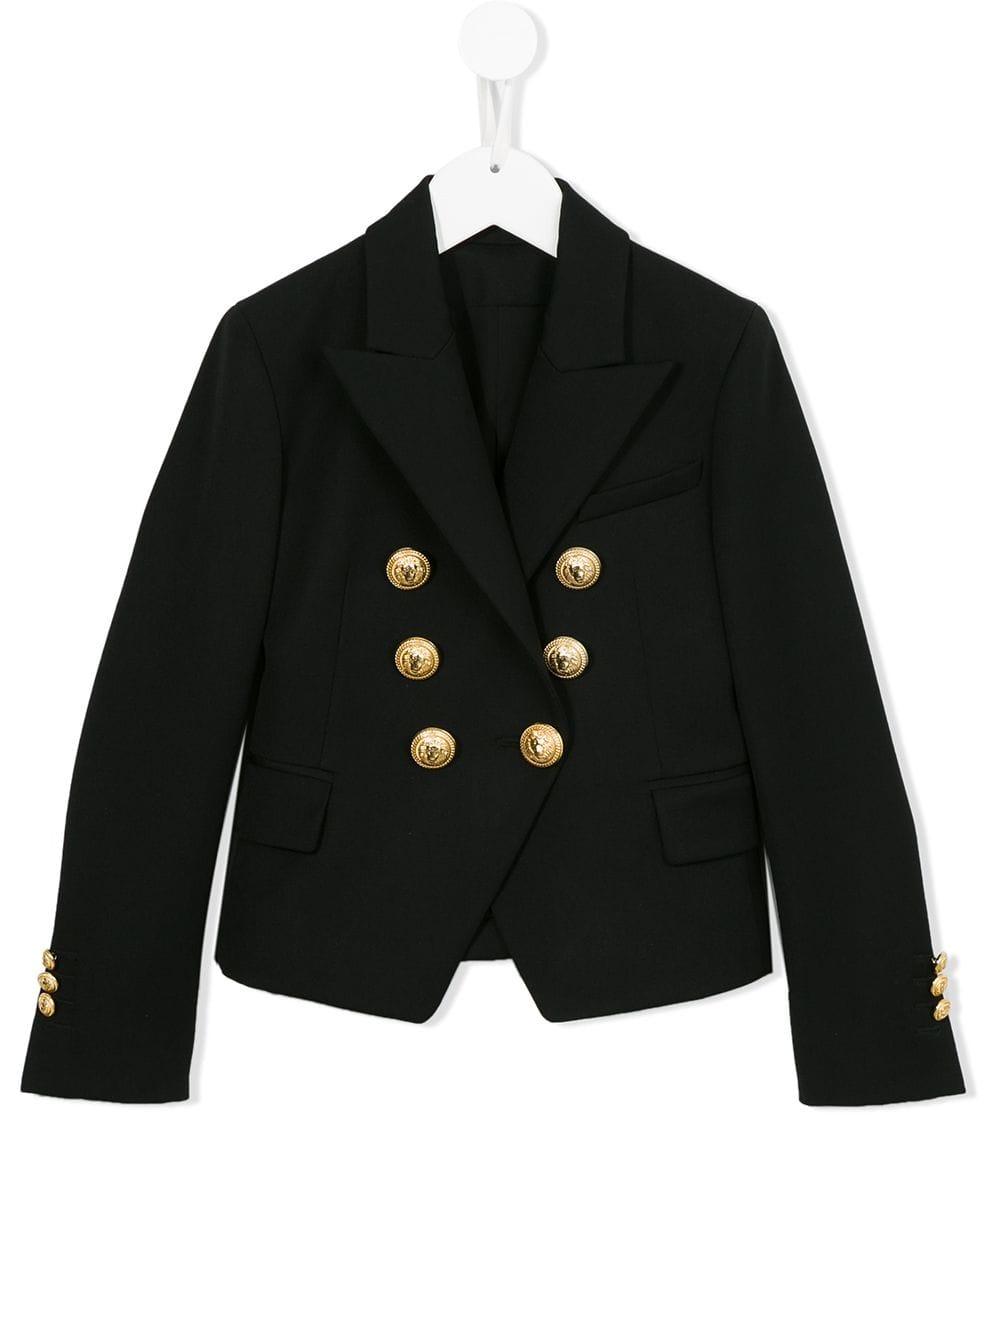 Black Velvet Blazer Tommy HILFIGER Velvet Jacket Black Cotton Velvet Women's Classic Military Sporty Blazer Large Small to Medium Size